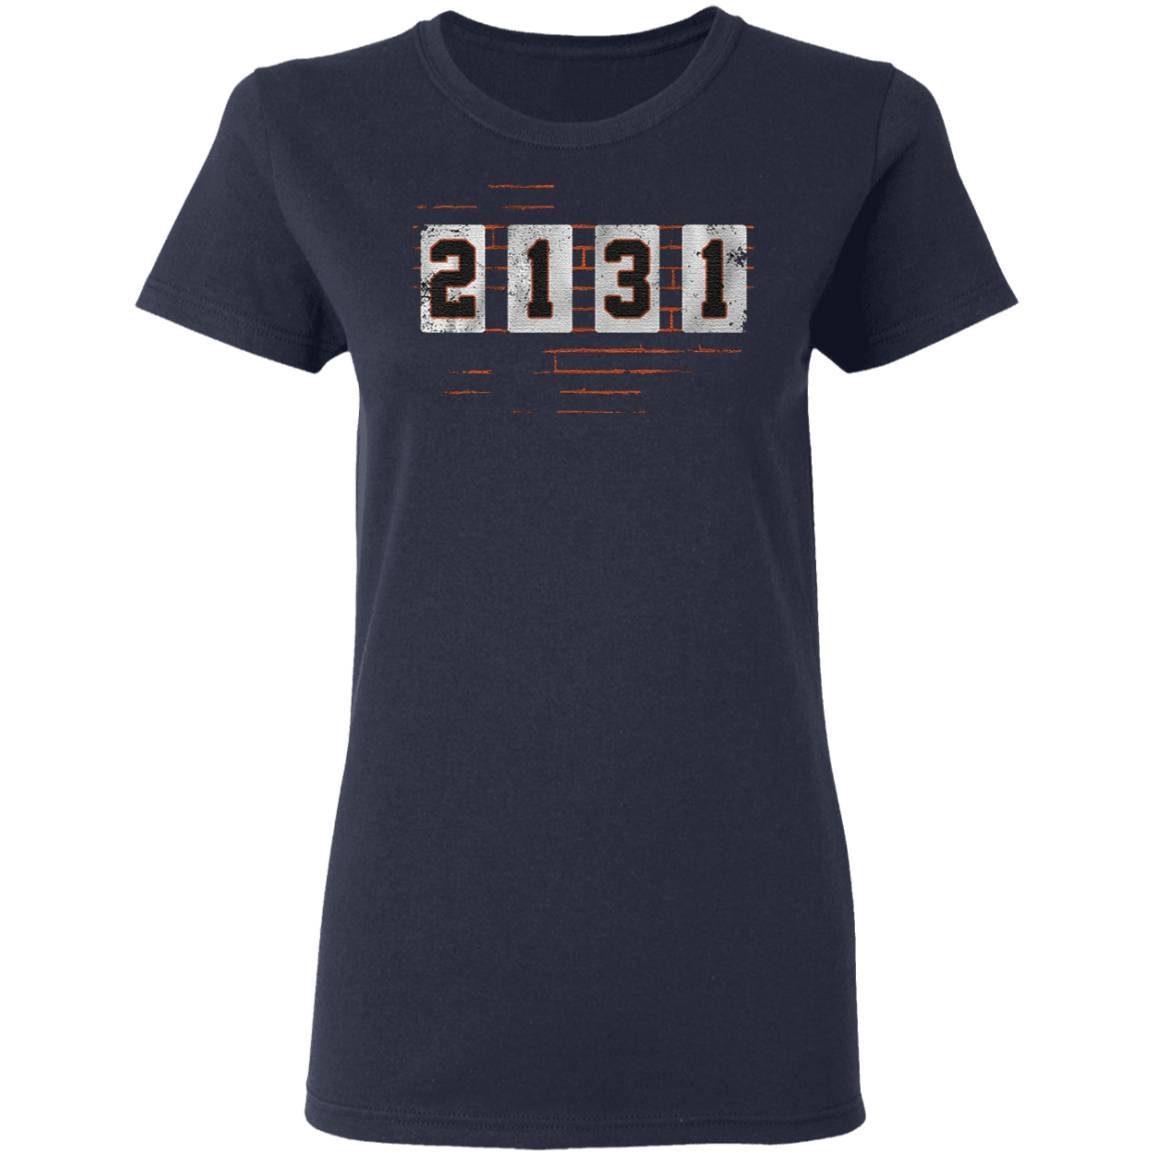 2131 Warehouse T Shirt